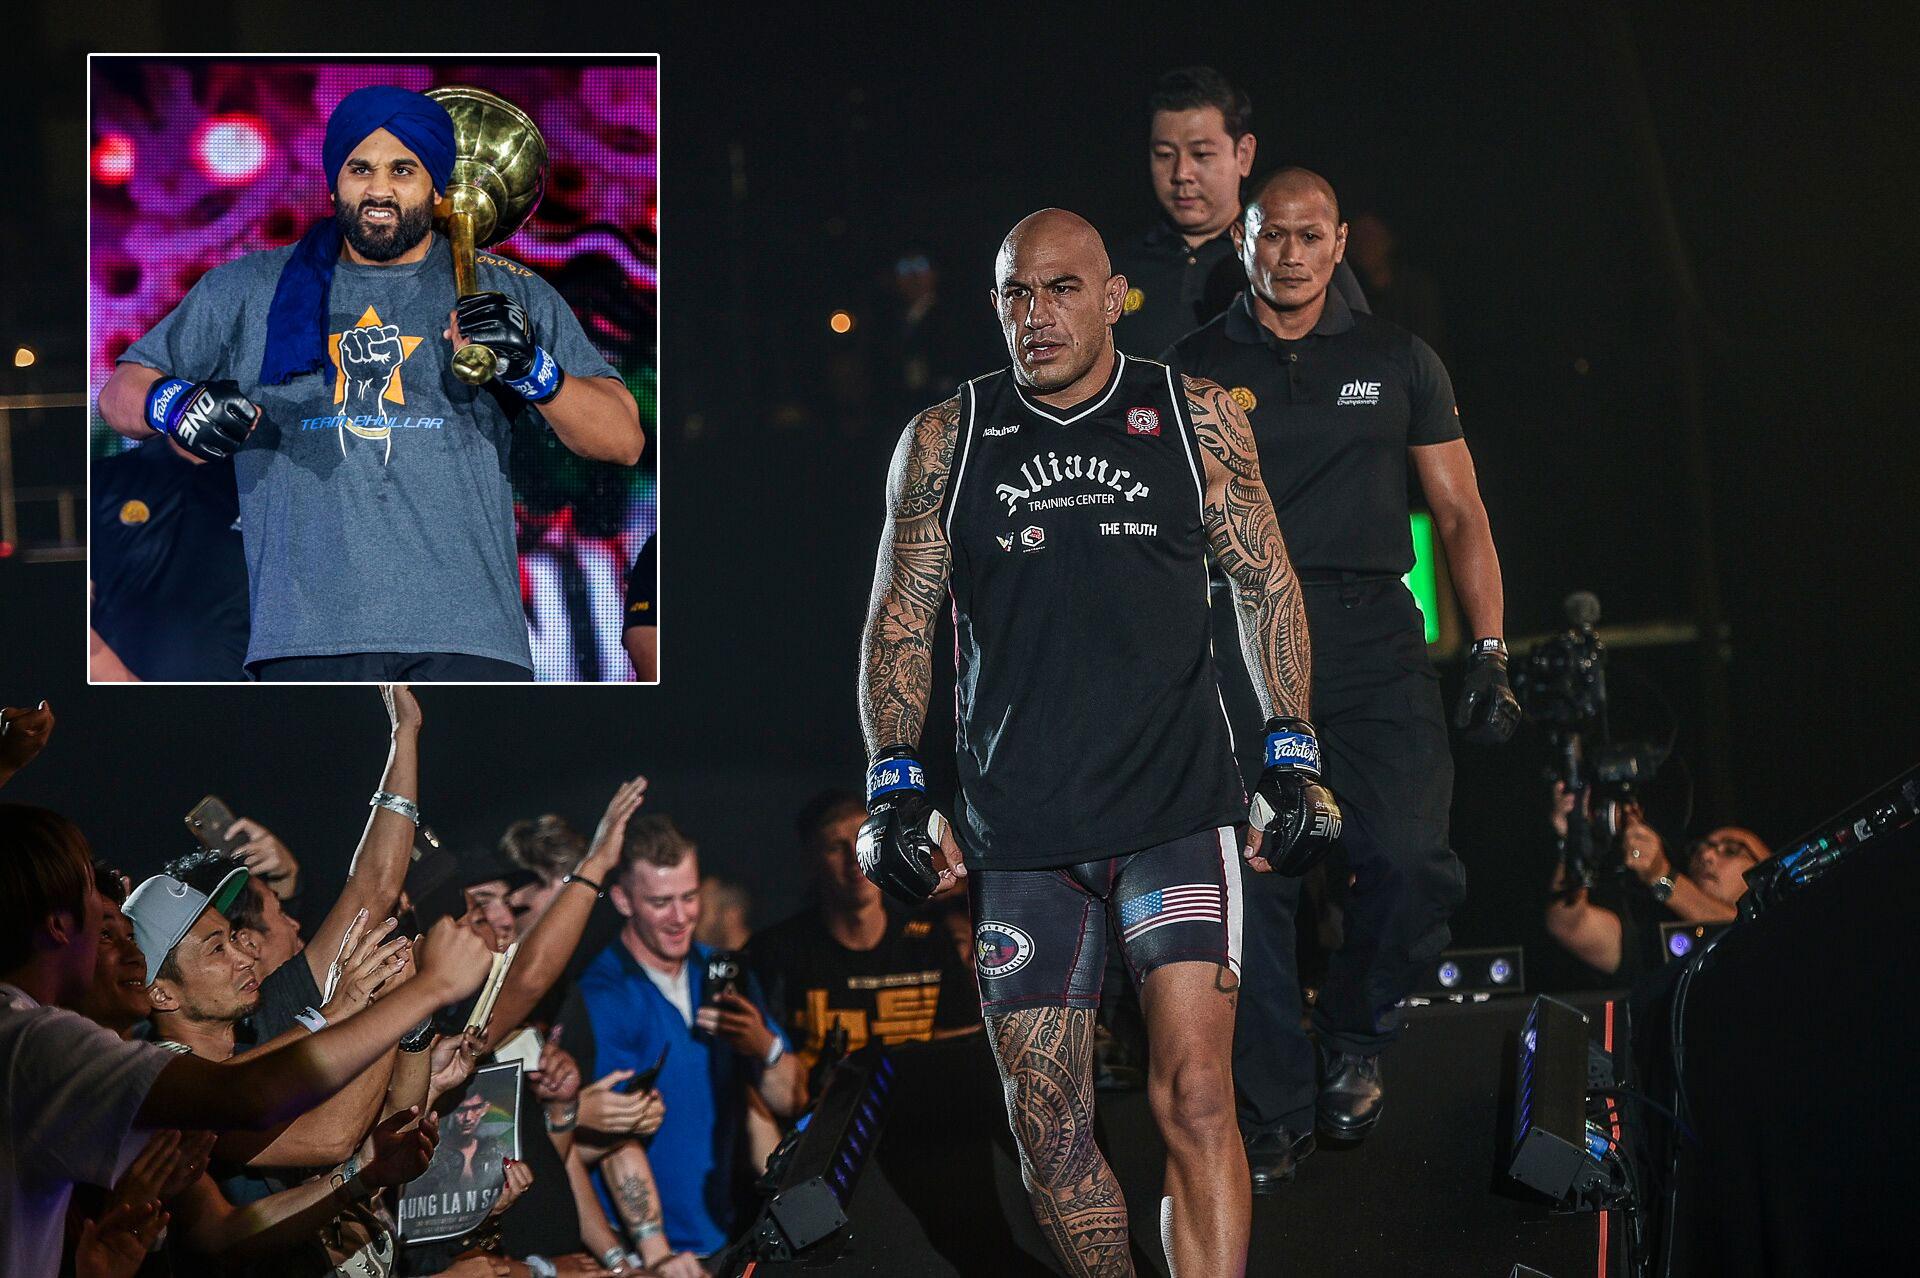 ONE-Century-Arjhan-Bhullar-vs-Brandon-Vera Brandon Vera yet to hear 'voice' urging him to retire on top Mixed Martial Arts News ONE Championship  - philippine sports news